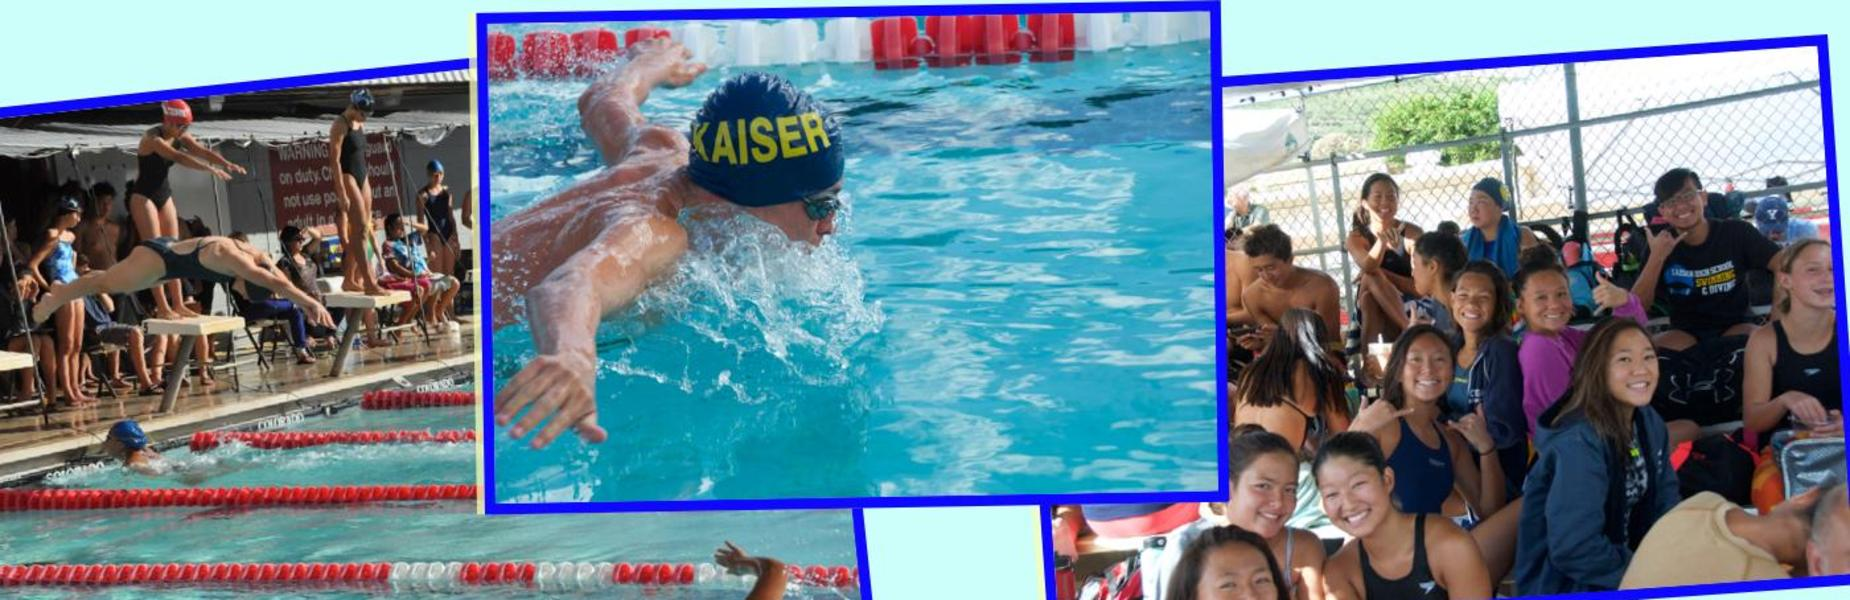 Kaiser swim OIA Champions